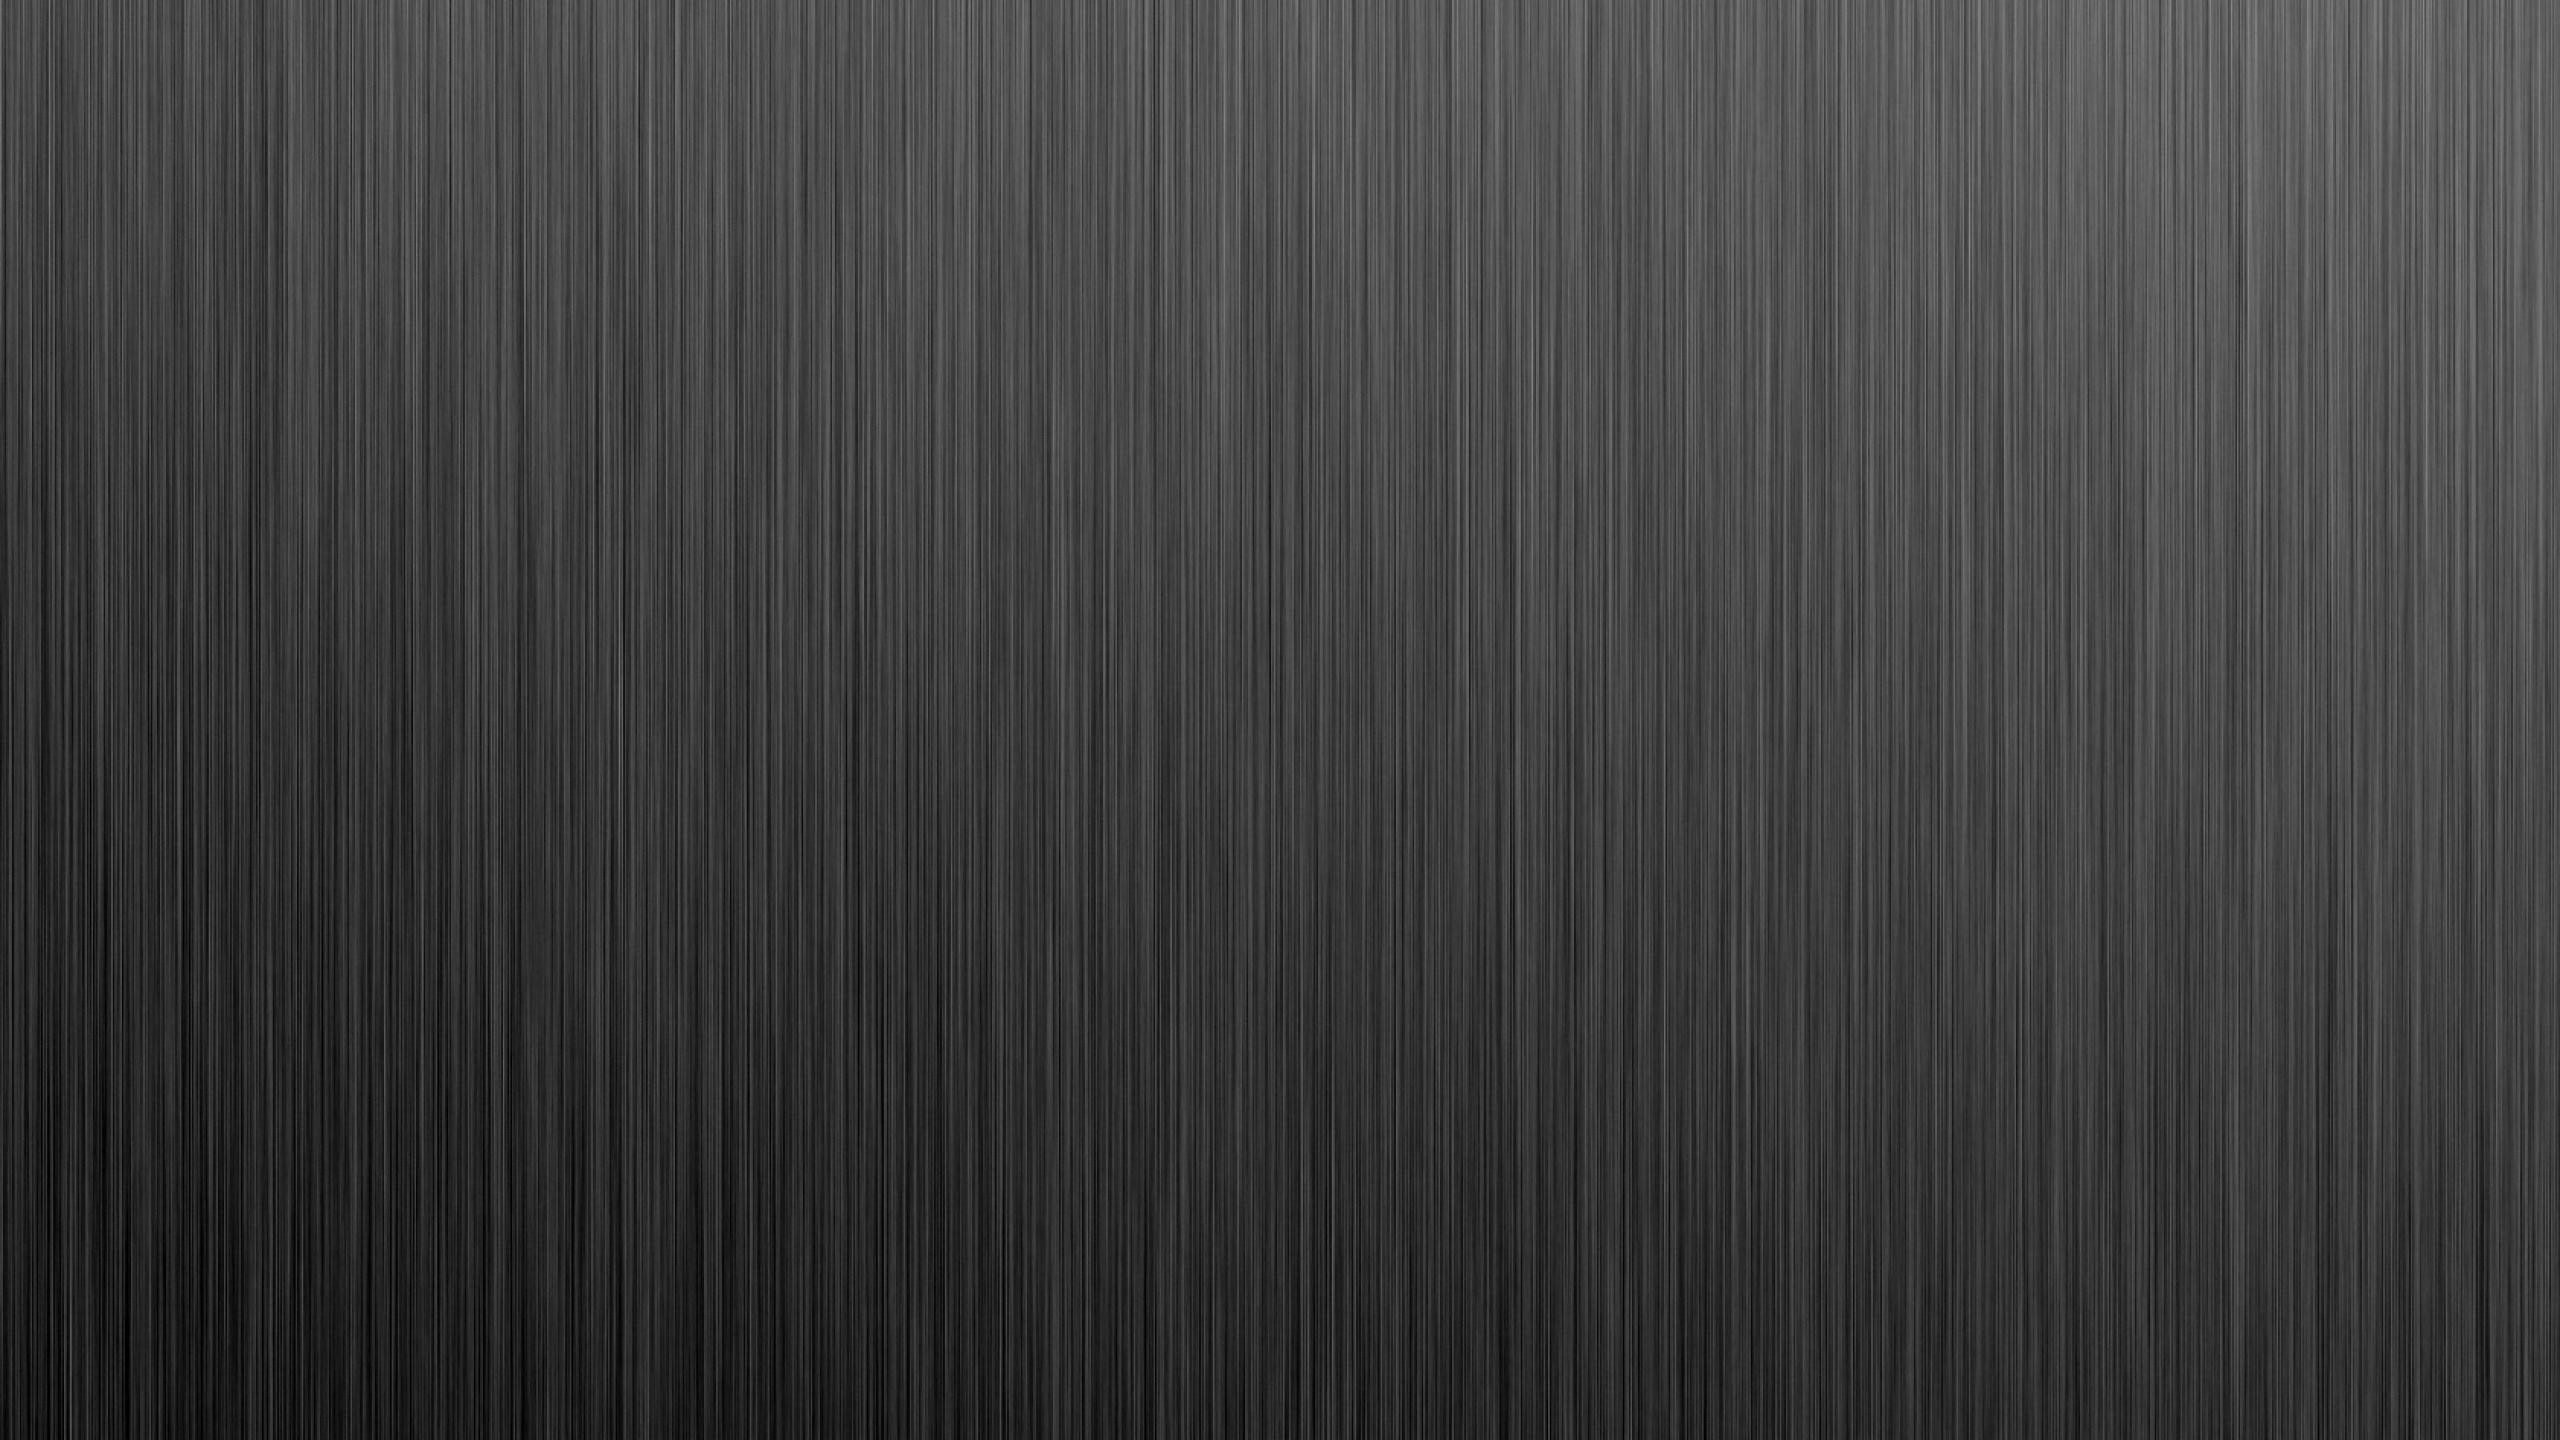 Aluminum Widescreen Wallpaper Wallpaper Desktop Images Background 2560x1440